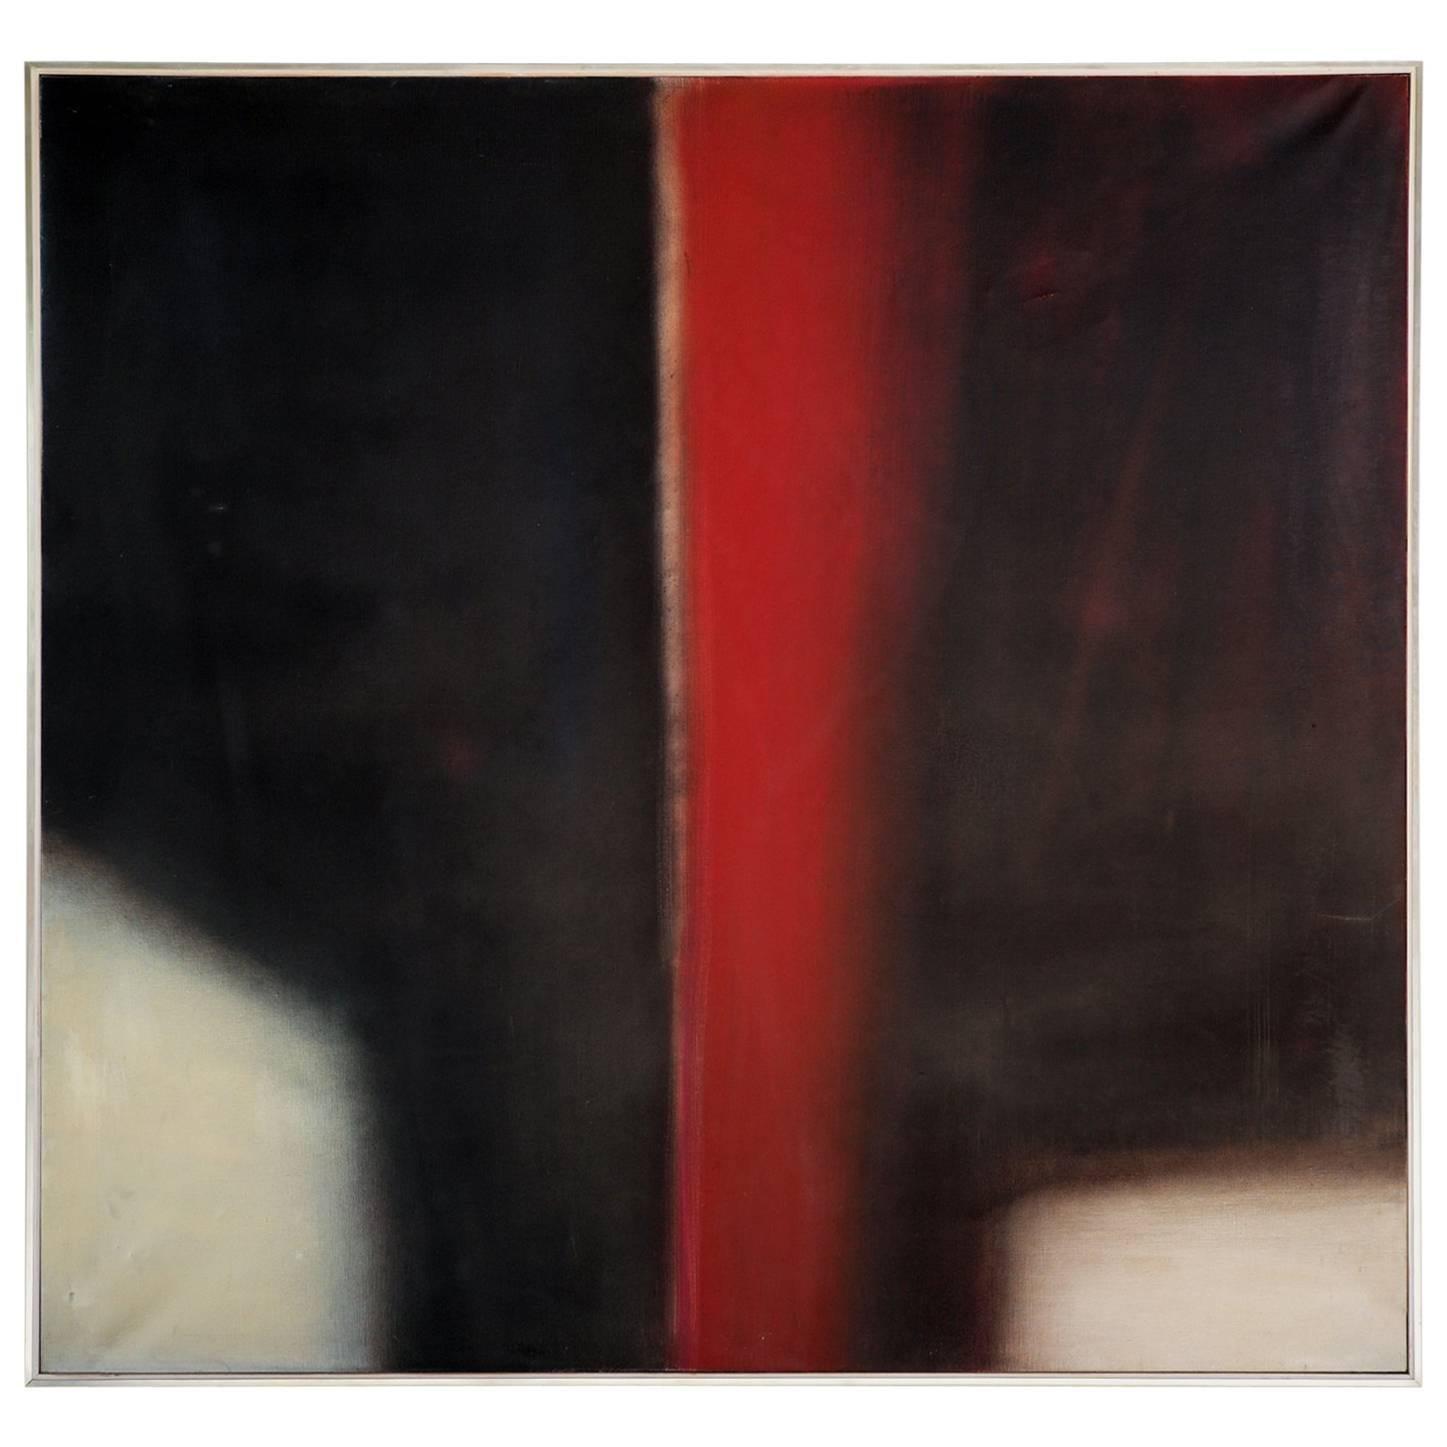 Claudio Olivieri, Diacromia, Oil on Canvas Dated 1971